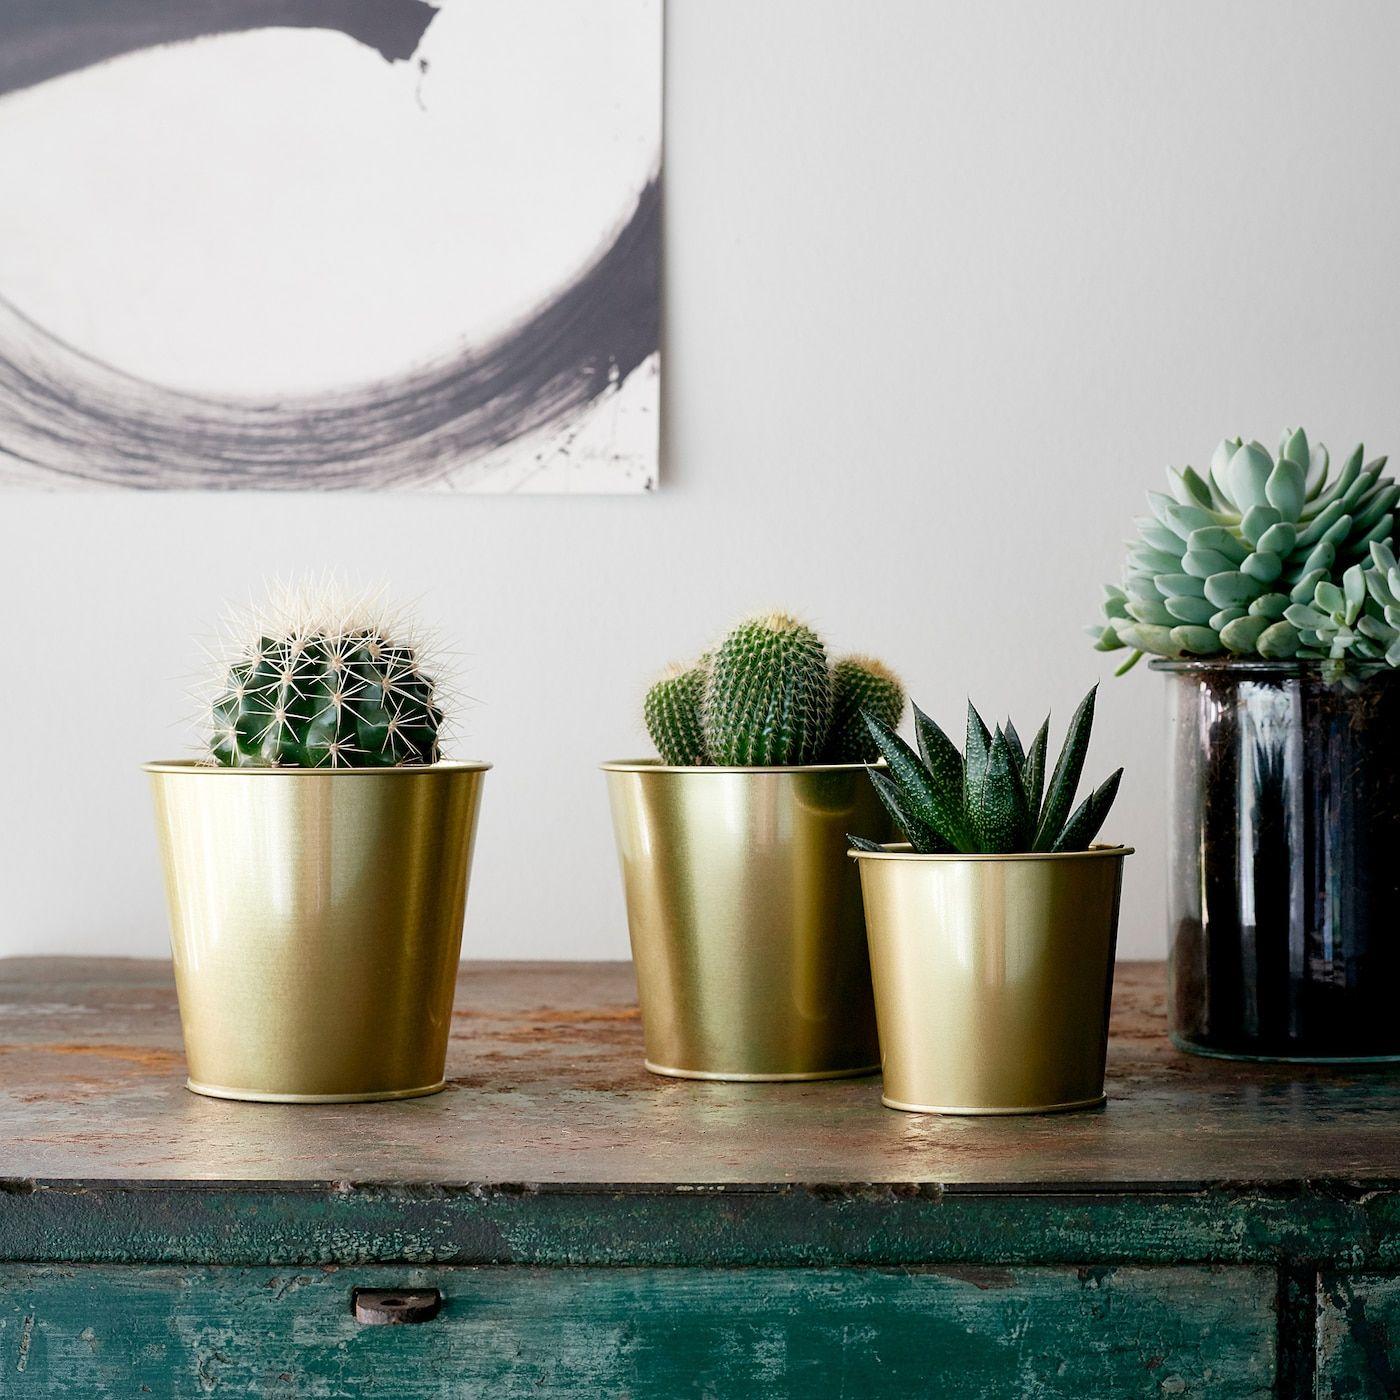 Daidai Ubertopf Messingfarben Ikea Osterreich Flower Pot Design Indoor Plant Pots Flower Pots